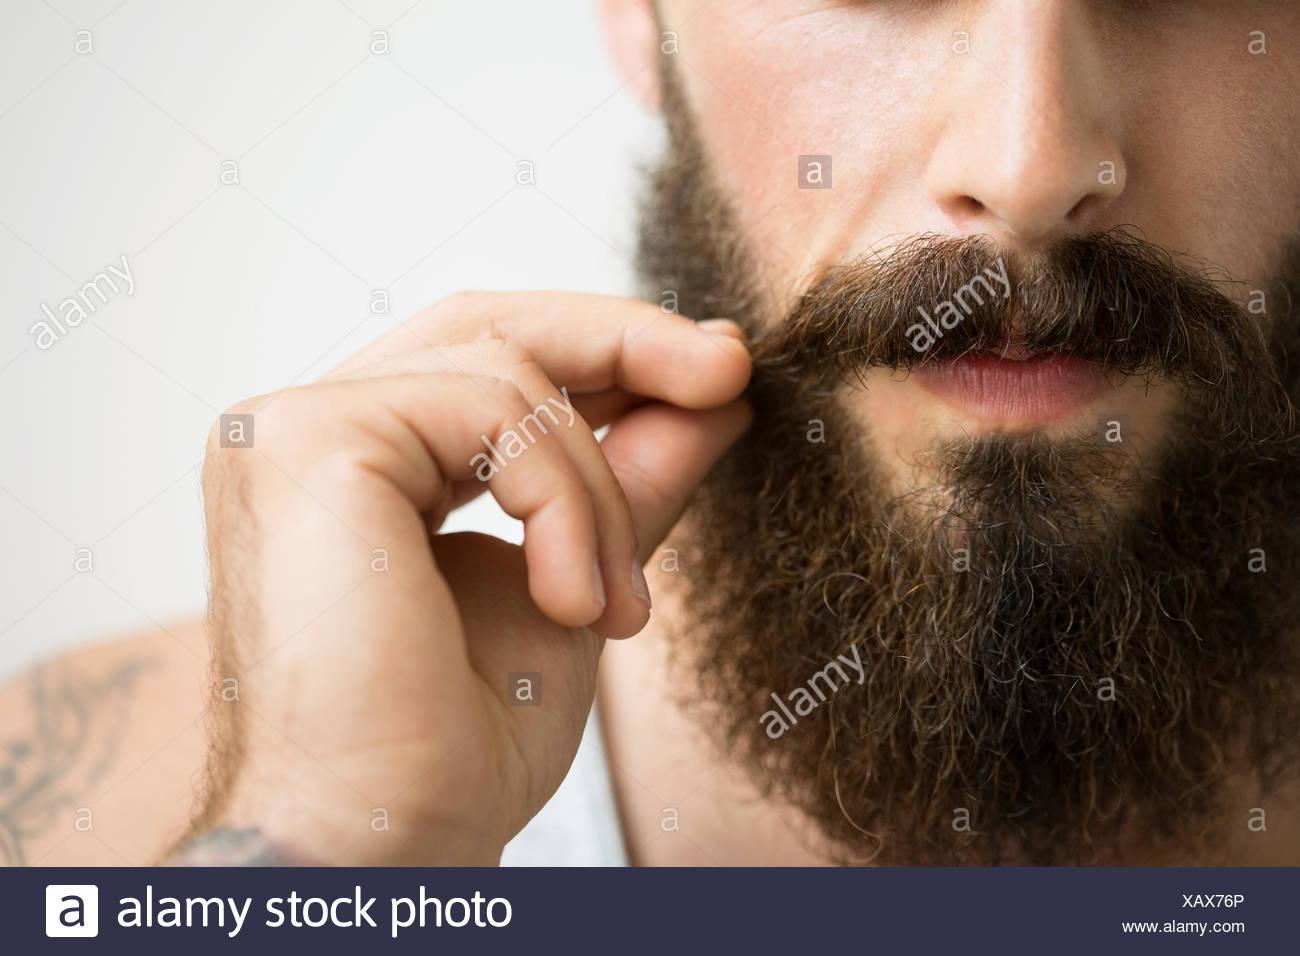 Close up uomo toccando i baffi Immagini Stock